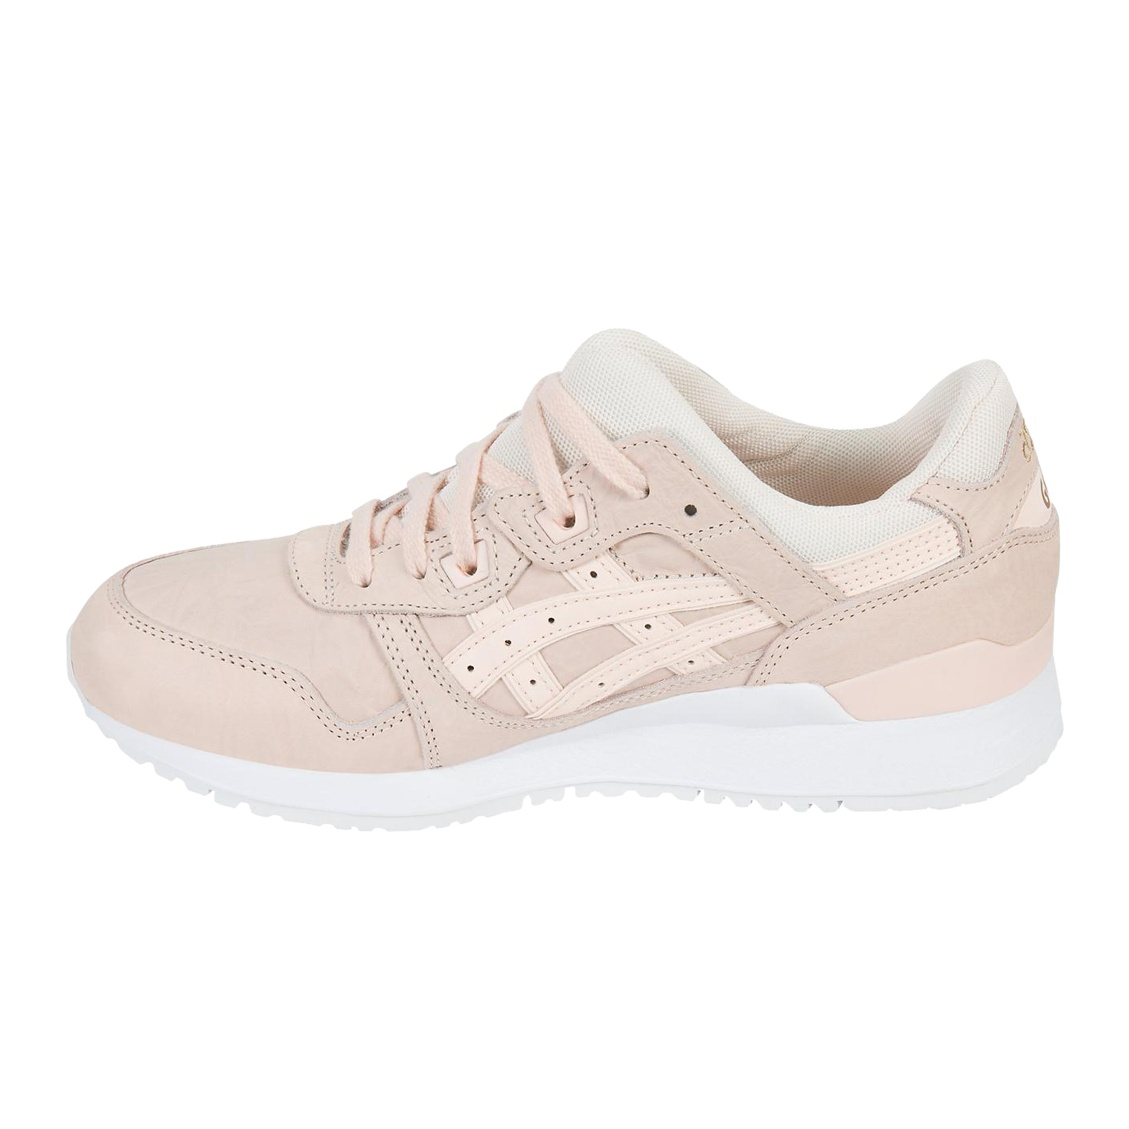 کفش مخصوص پیاده روی زنانه اسیکس مدل GEL LYTE III